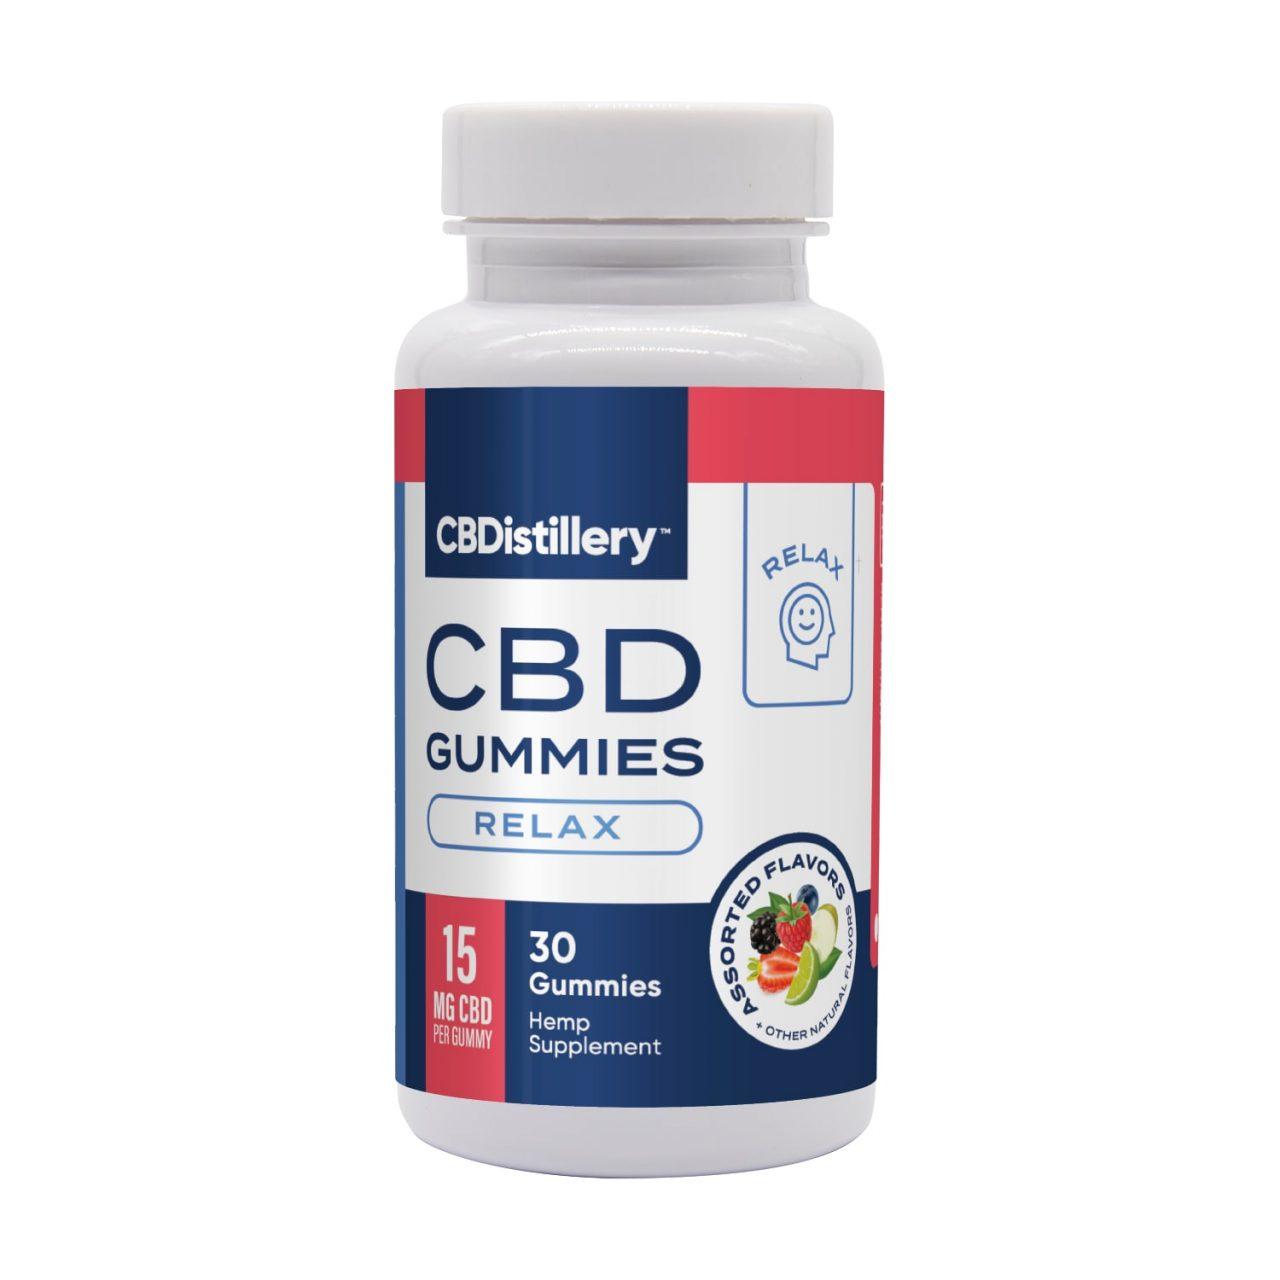 CBDistillery, 15mg Isolate CBD Gummies, Assorted Flavors, 30ct, 450mg CBD